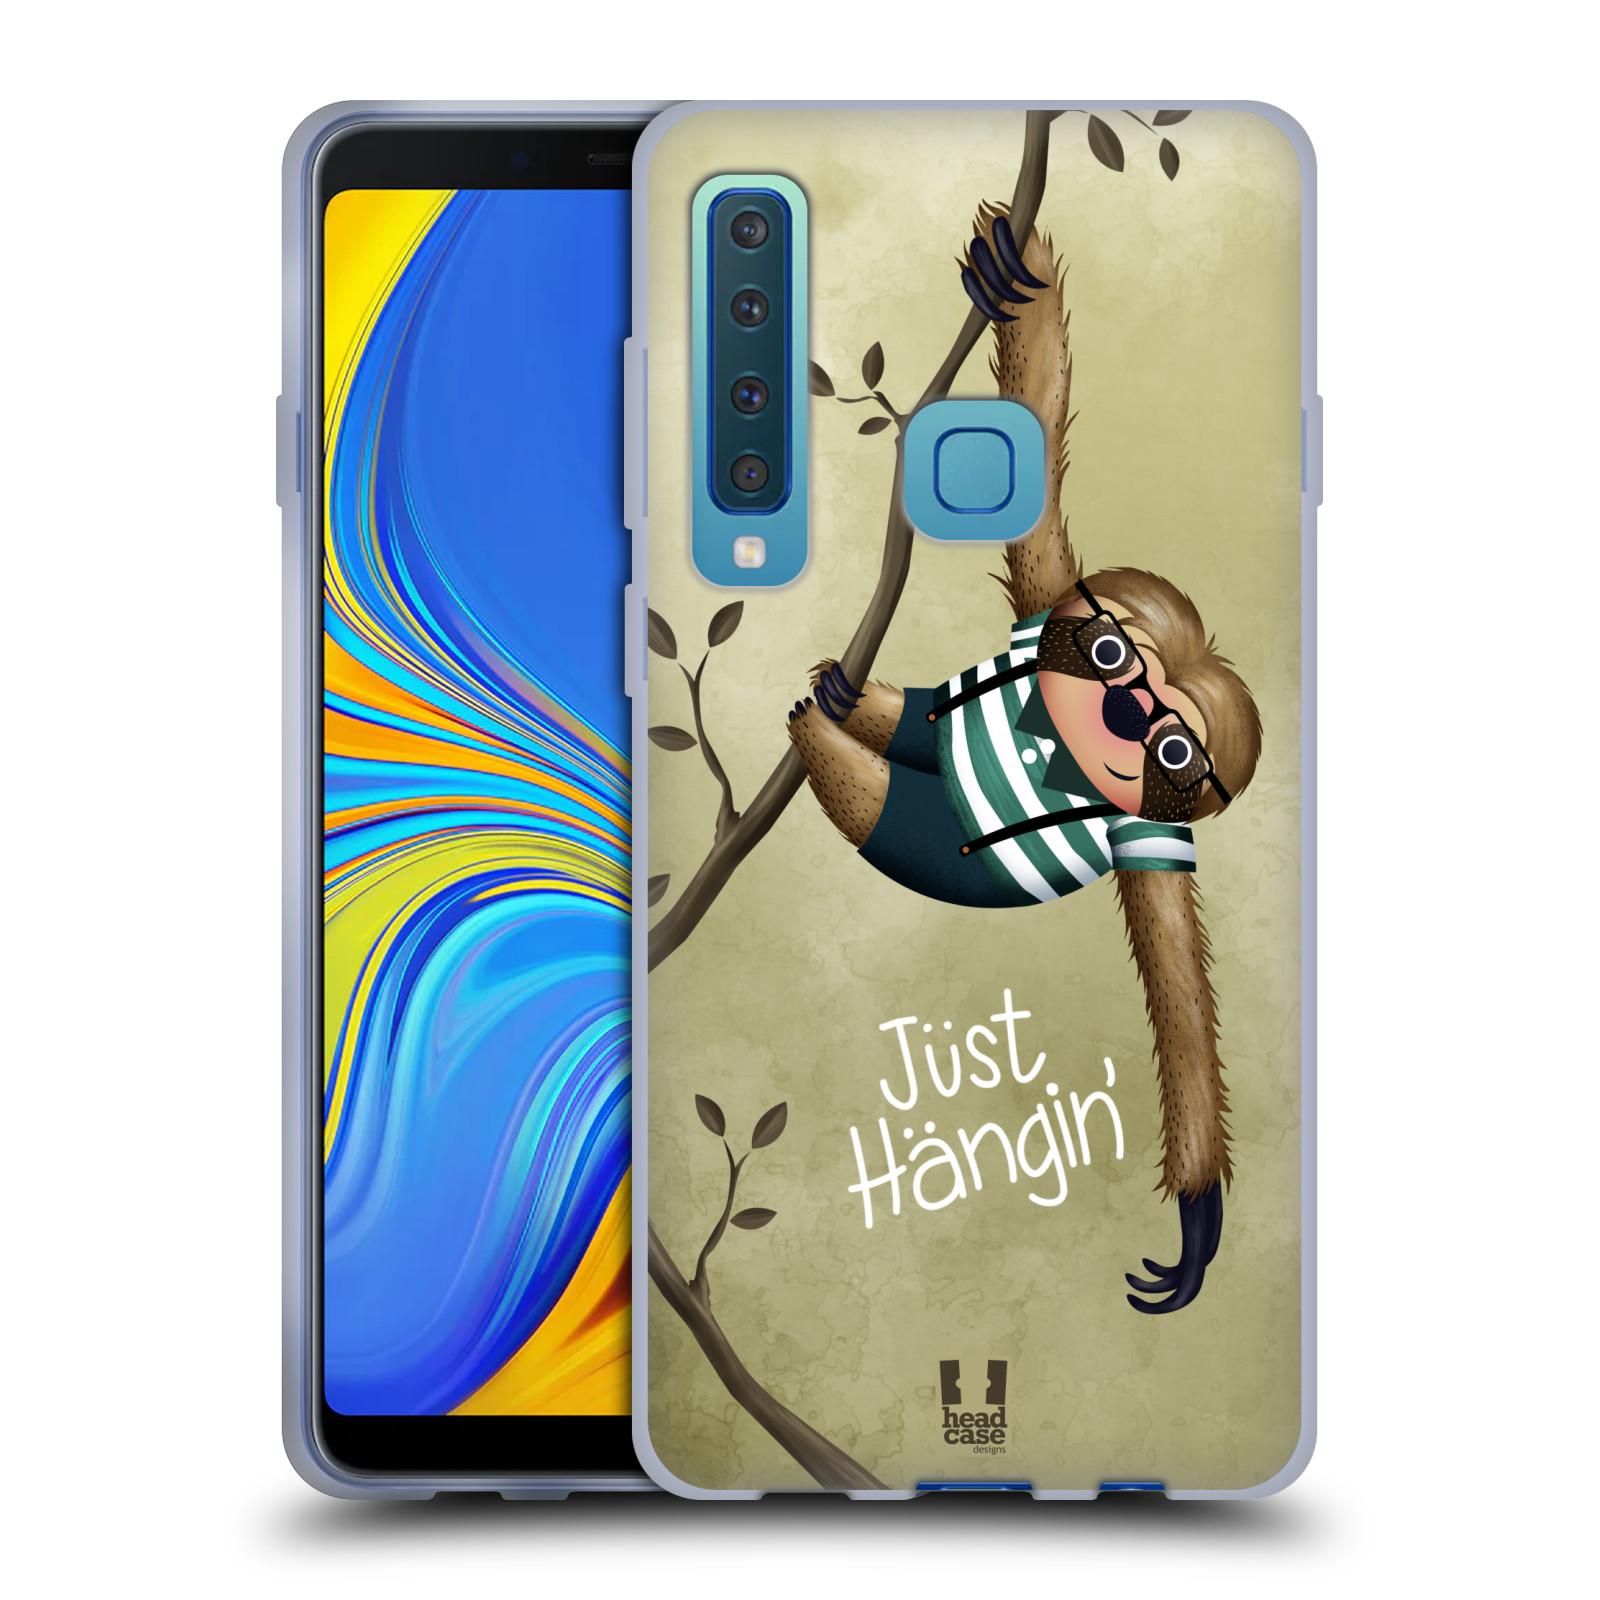 Silikonové pouzdro na mobil Samsung Galaxy A9 (2018) - Head Case - Lenochod Just Hangin